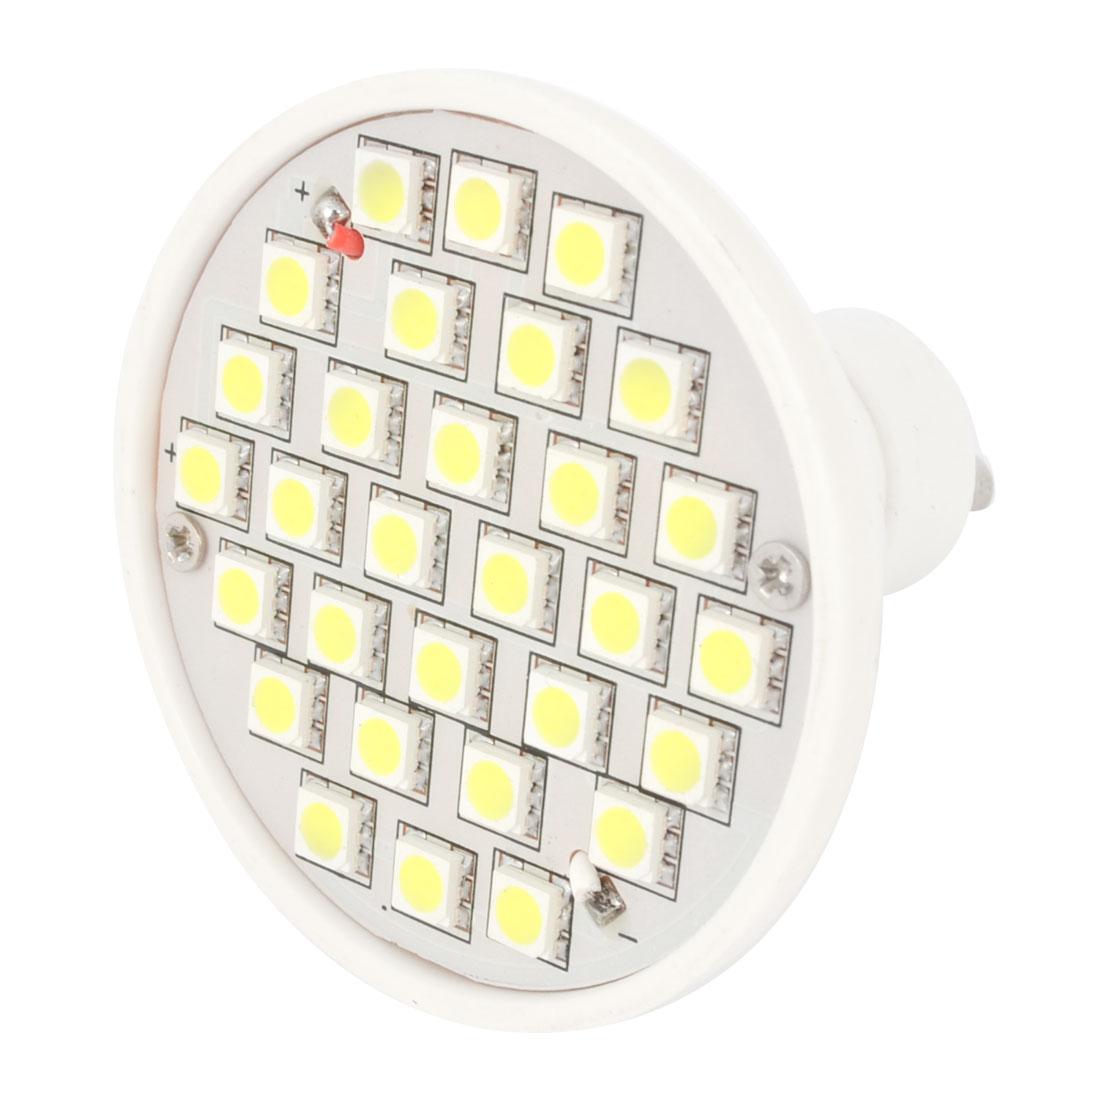 AC 220V White 30 3528 SMD LED Spot Light Energy Saving Bulb GU10 3000K 3W